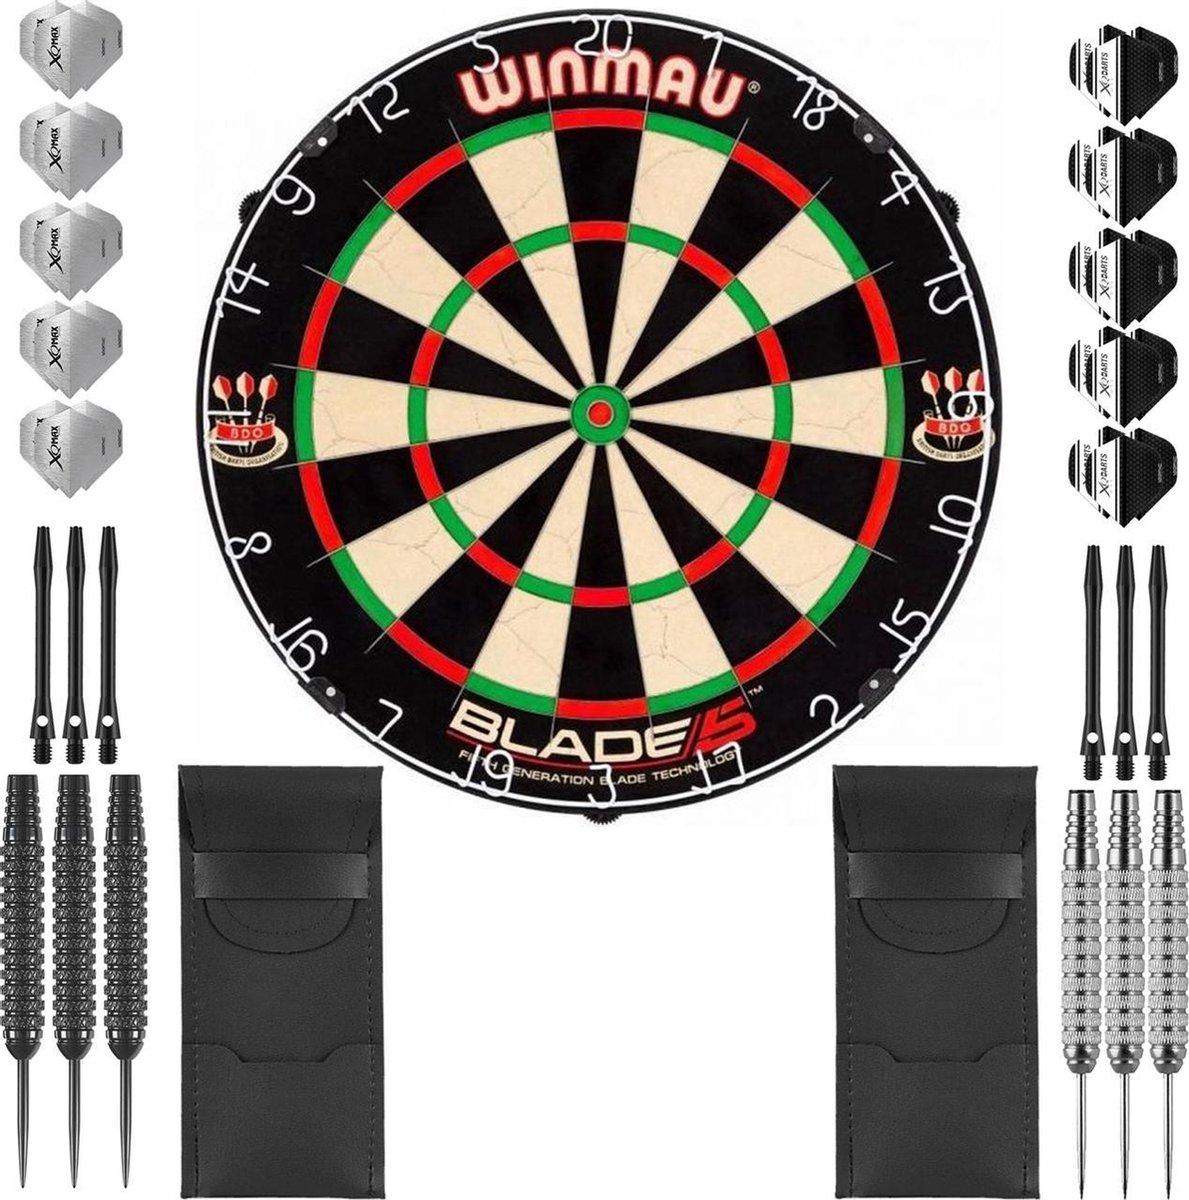 Dragon Darts complete Mega Ray dartset - Winmau blade 5 - dartbord - dart shafts - dart flights - dartpijlen 24 gram - 100% brass - 2 sets - dartpijlen